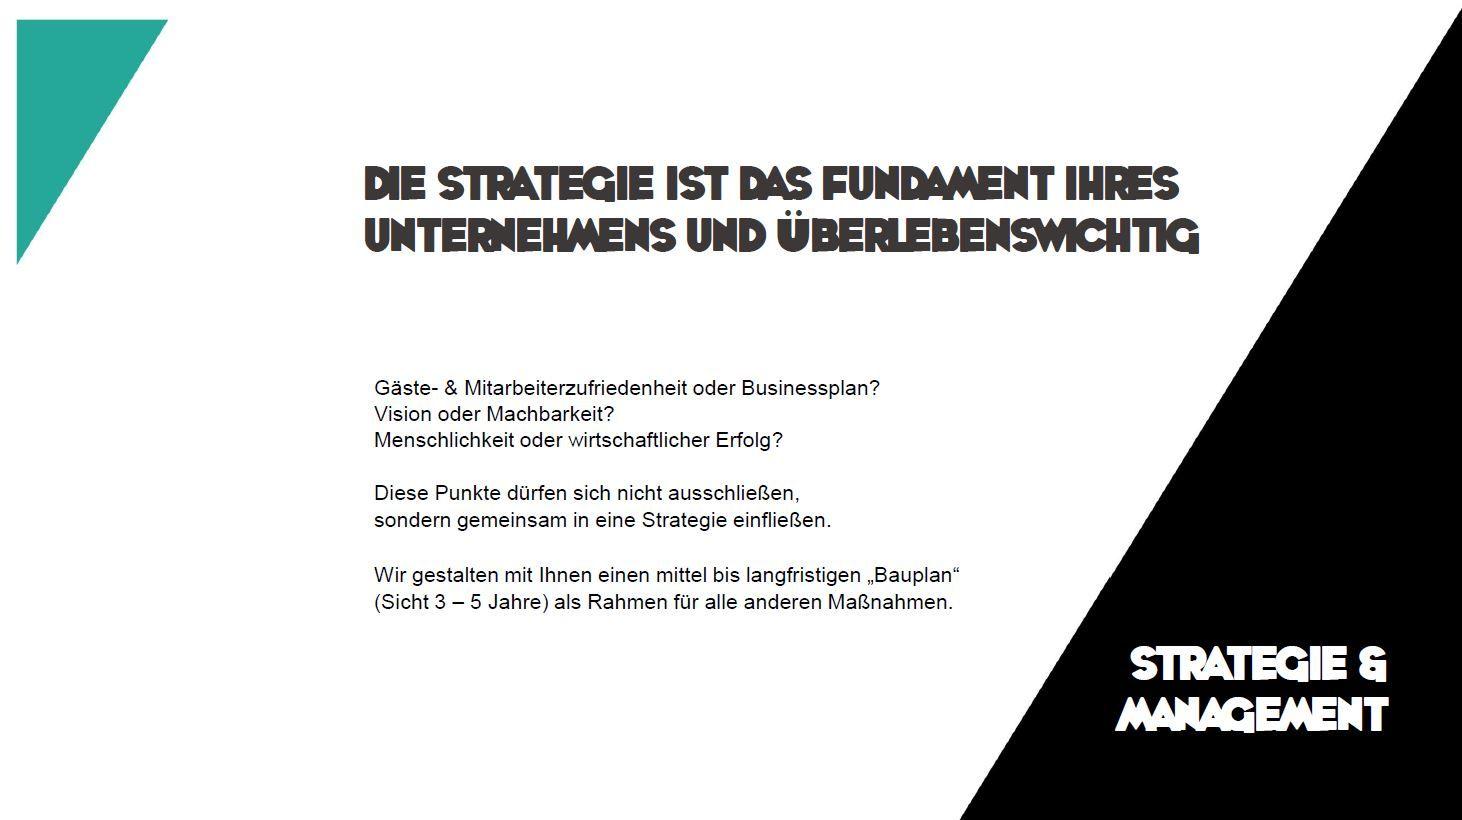 Großartig Erfolg Vision Rahmen Ideen - Rahmen Ideen ...